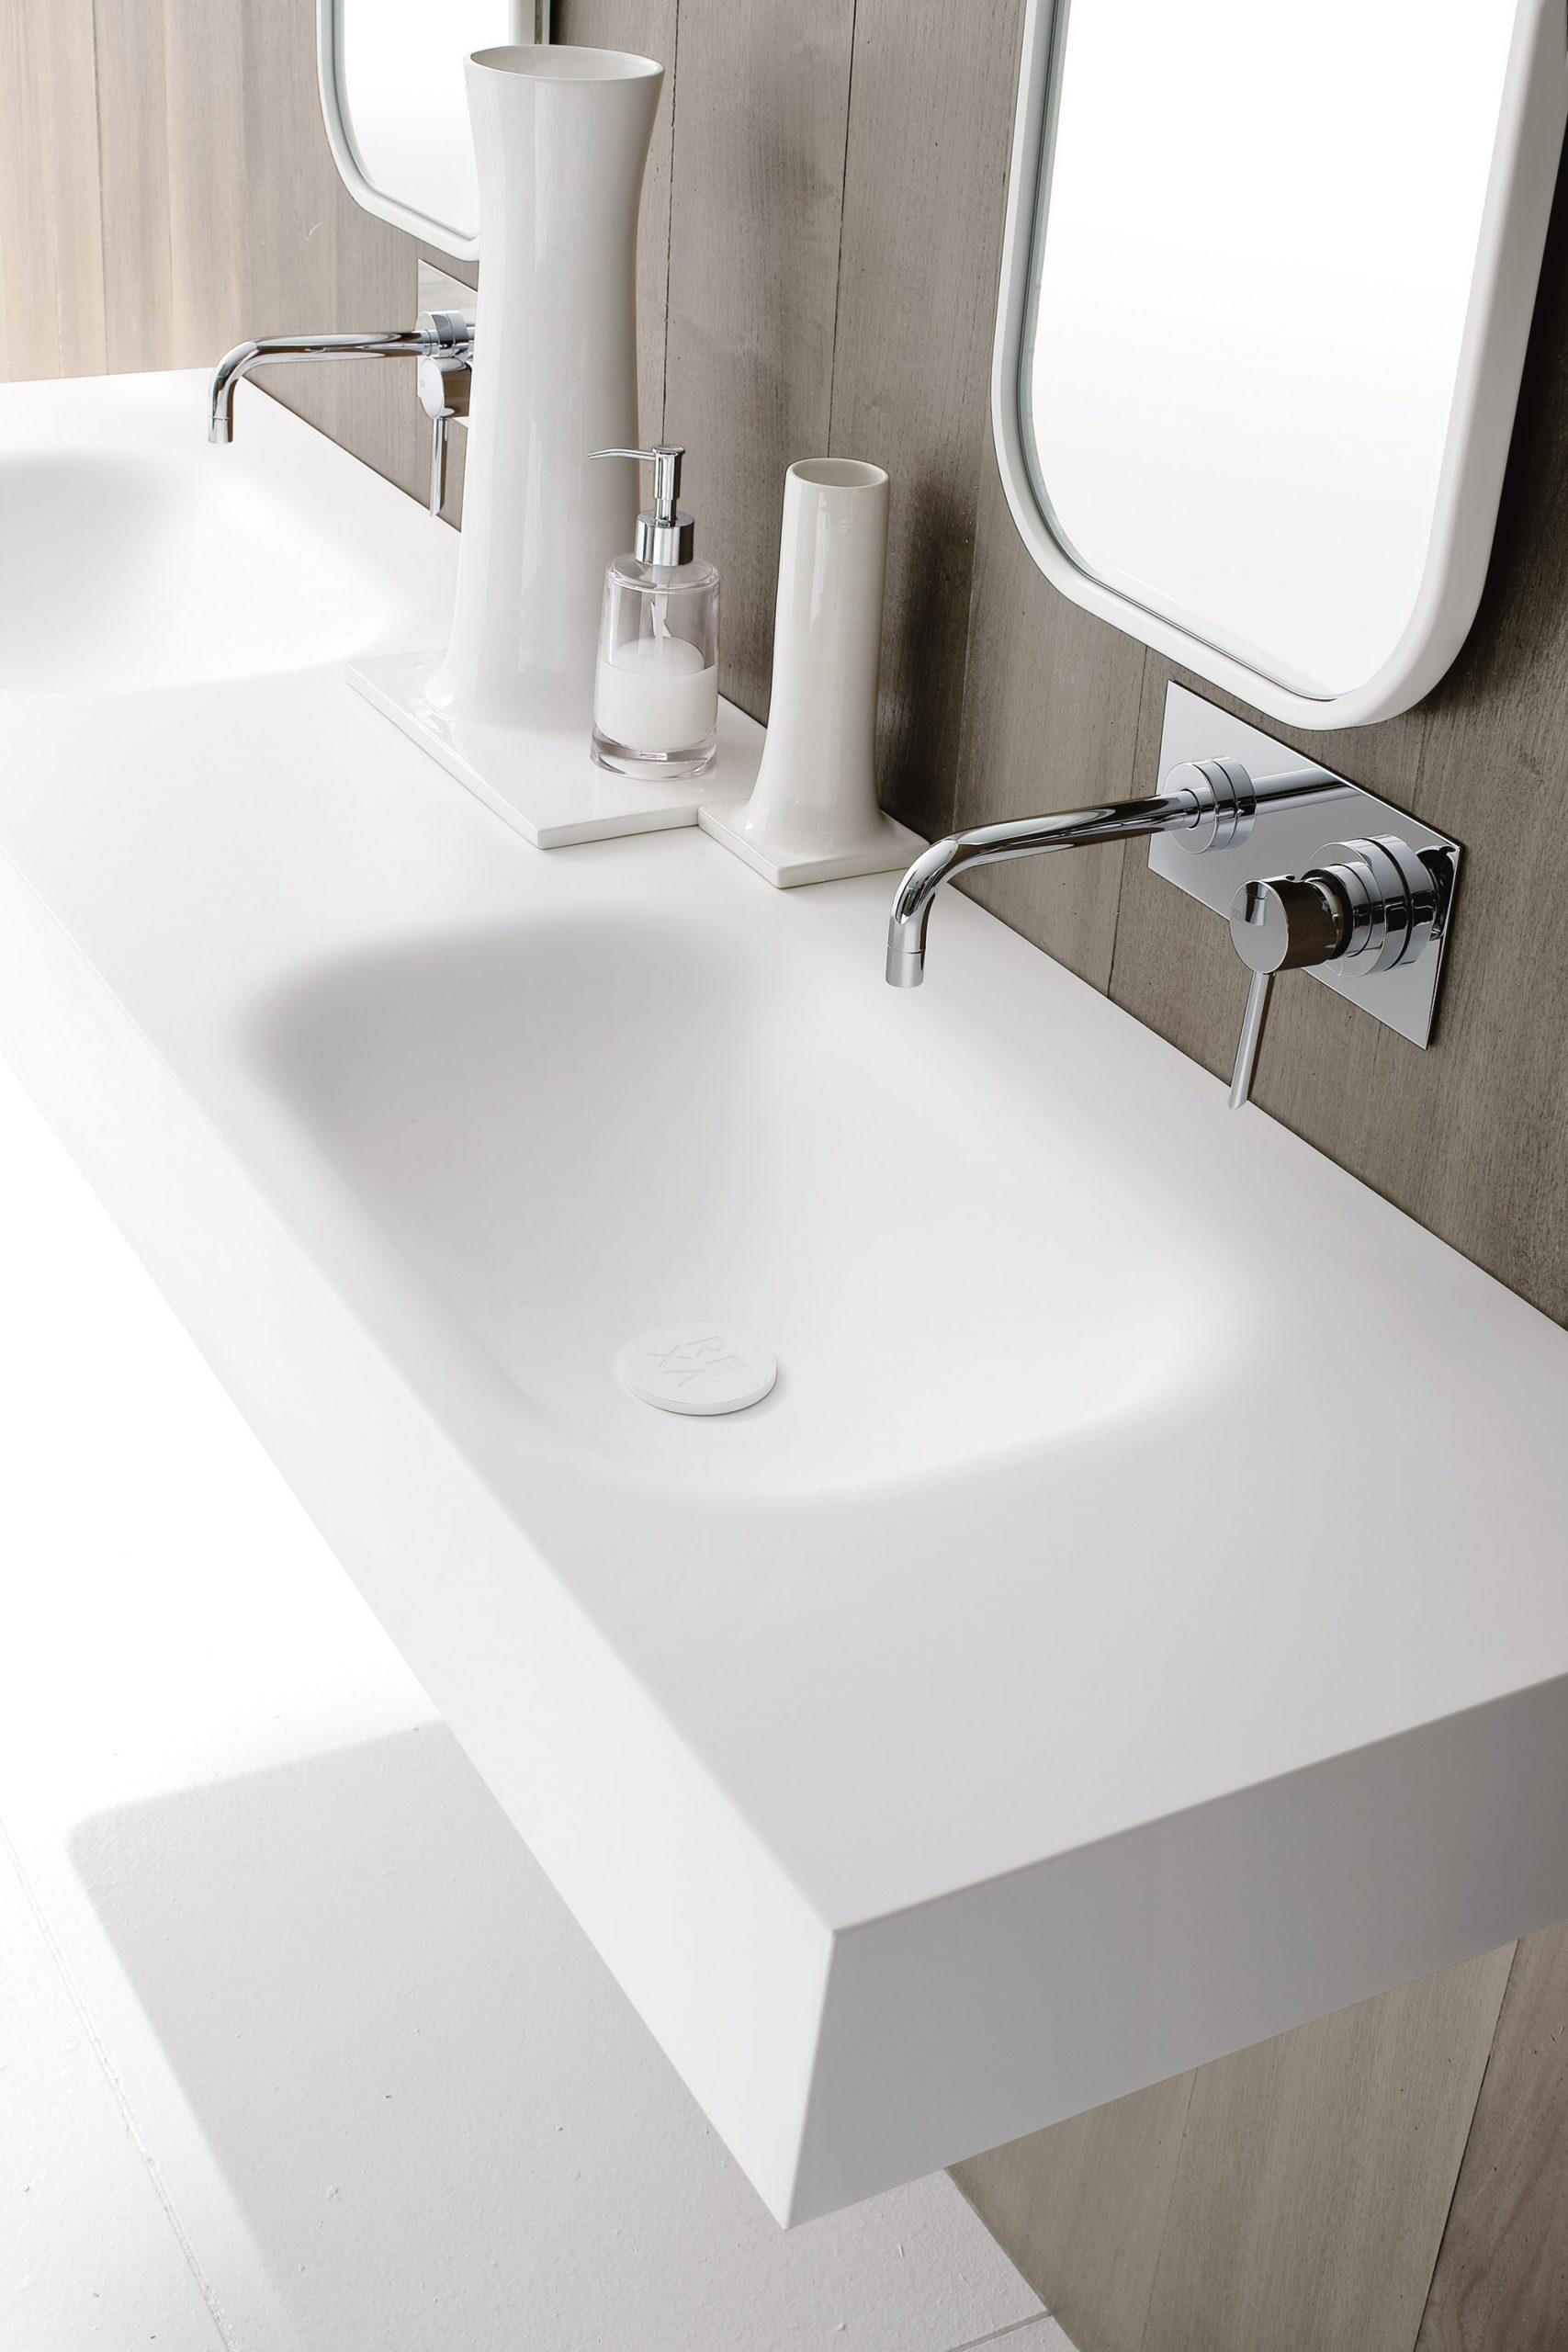 corian countertop bathroom sinks  DOUBLE CORIAN® WASHBASIN COUNTERTOP MOODE COLLECTION BY ..